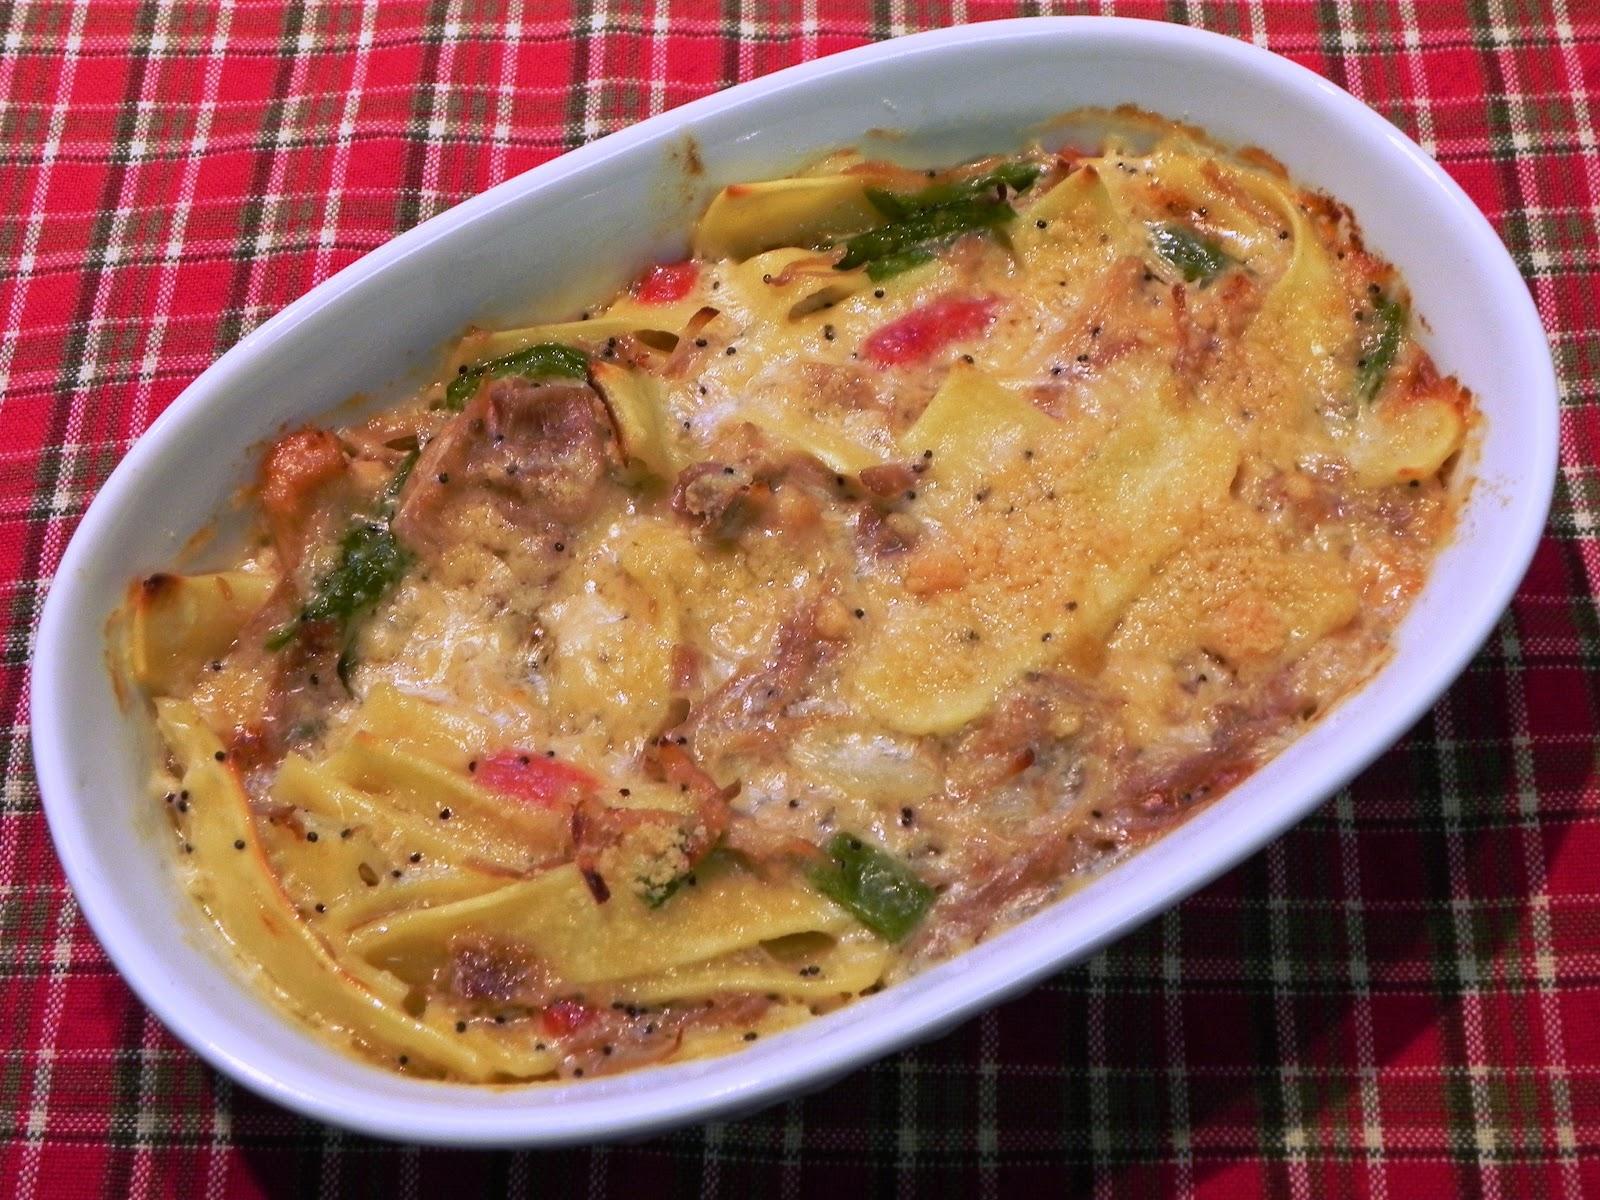 The Iowa Housewife: Turkey Noodle Poppy Seed Casserole